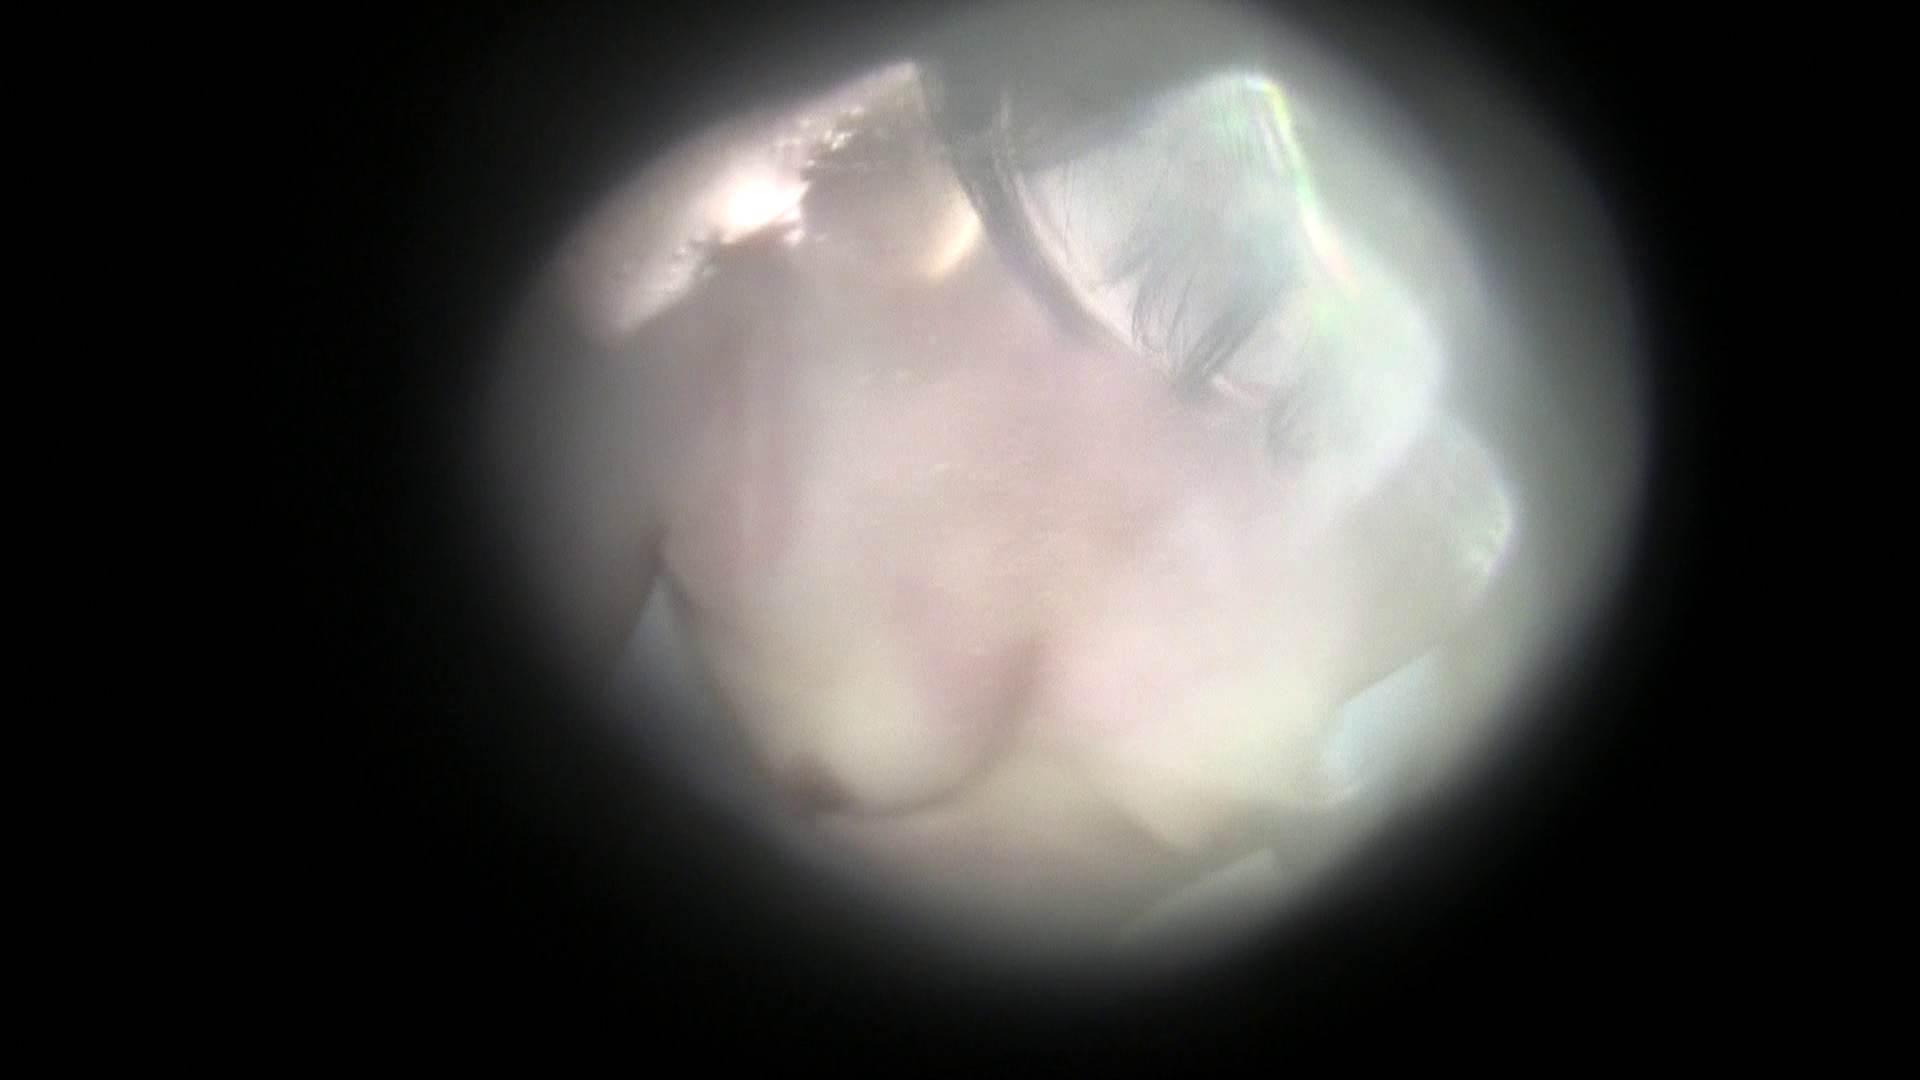 NO.11 年増の一本道!!中身ハミ出てます シャワー室 おめこ無修正動画無料 97画像 67